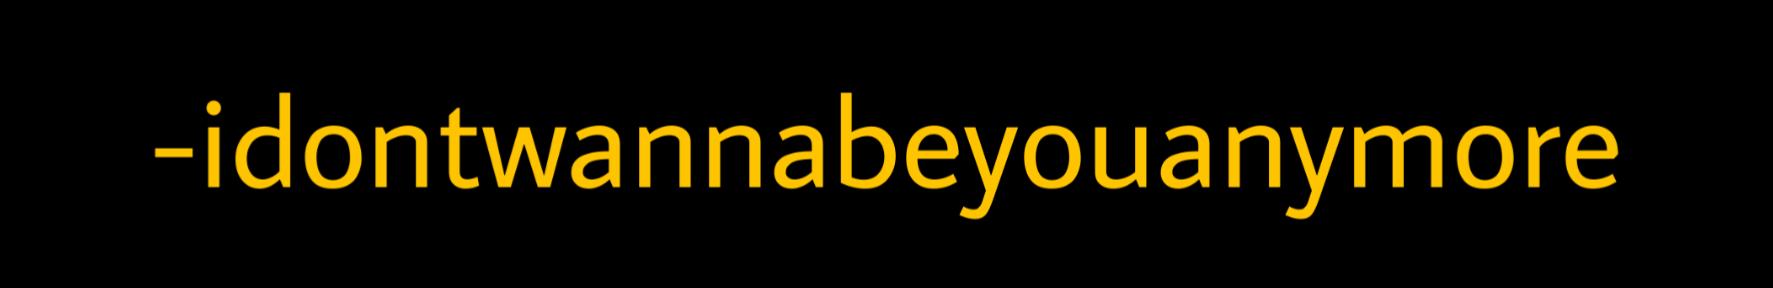 #billieeilish #billieeilishsticker #idontwannabeyouanymore #freetoedit #quote #yellowquote #tumblrquotes #sticker #quotes